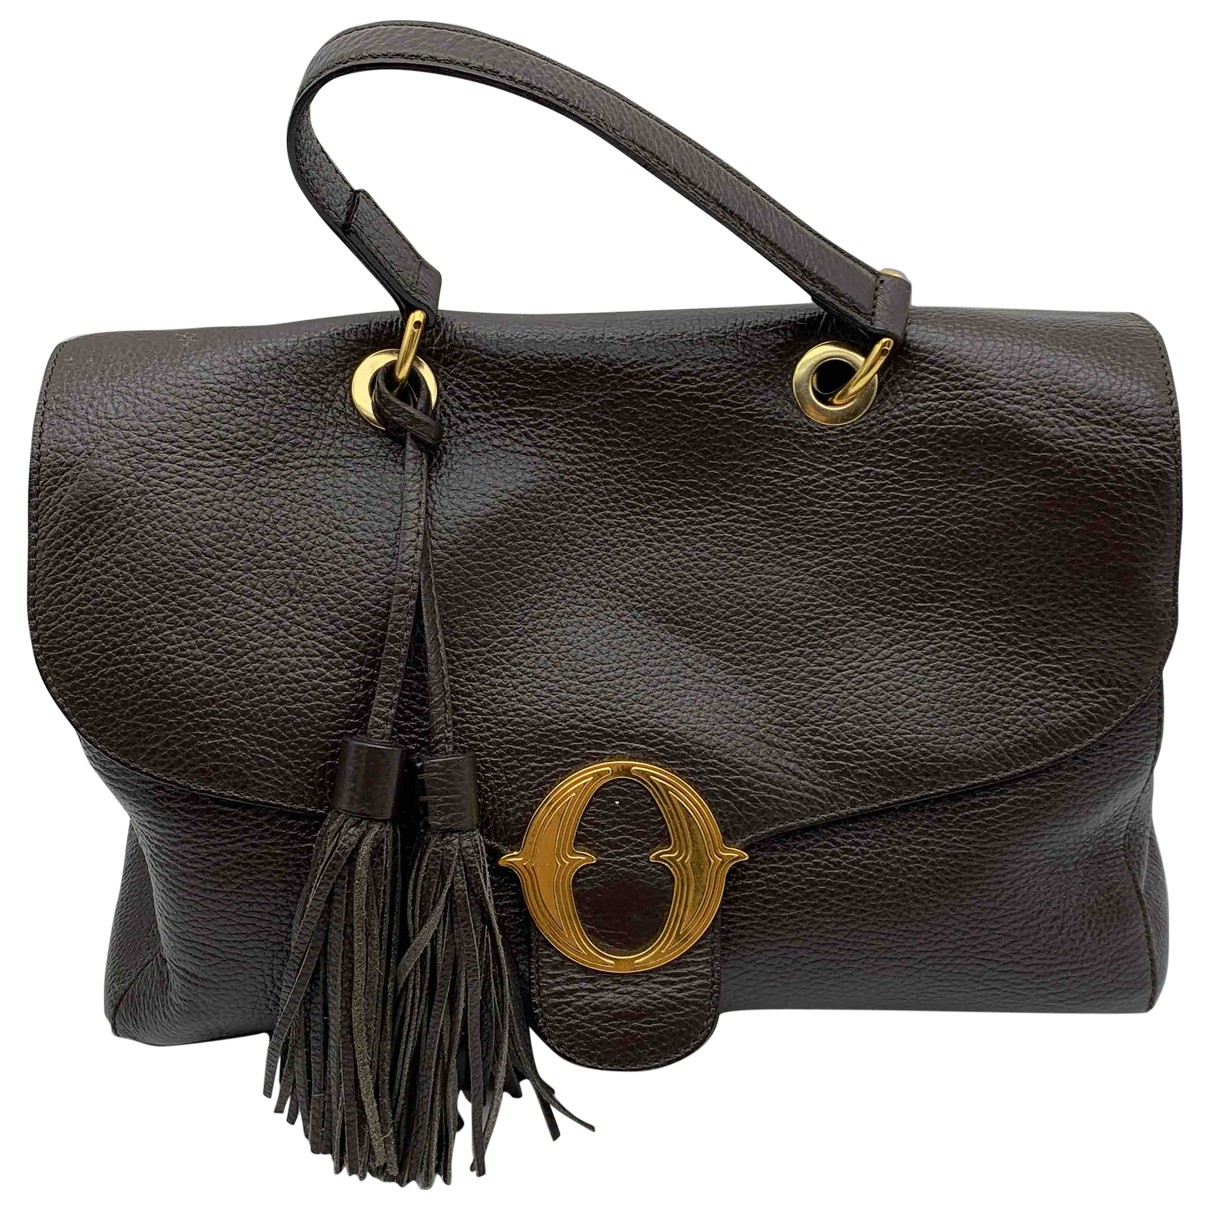 Ottod'ame N Brown Leather handbag for Women N